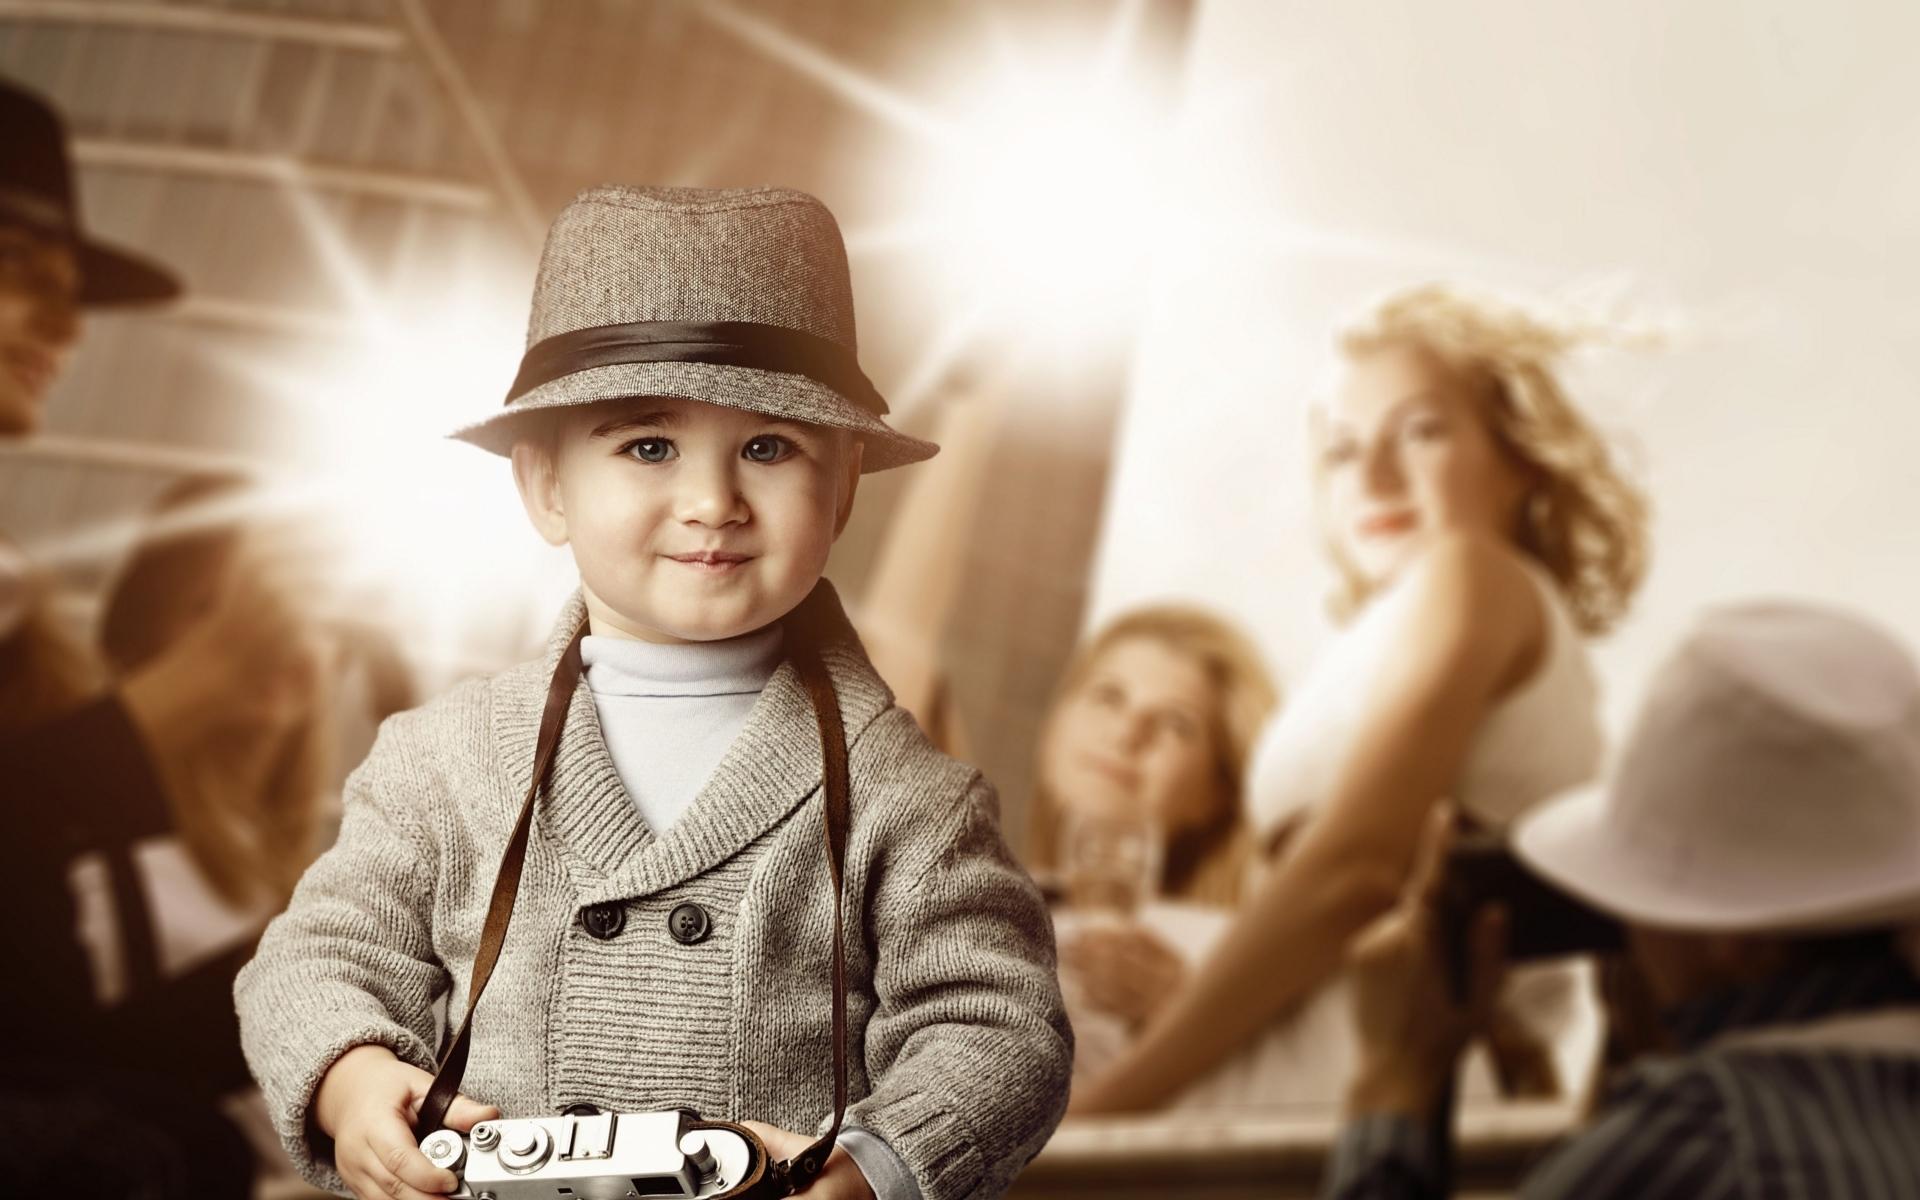 Картинки Ребенок, вечеринка, камера, люди фото и обои на рабочий стол